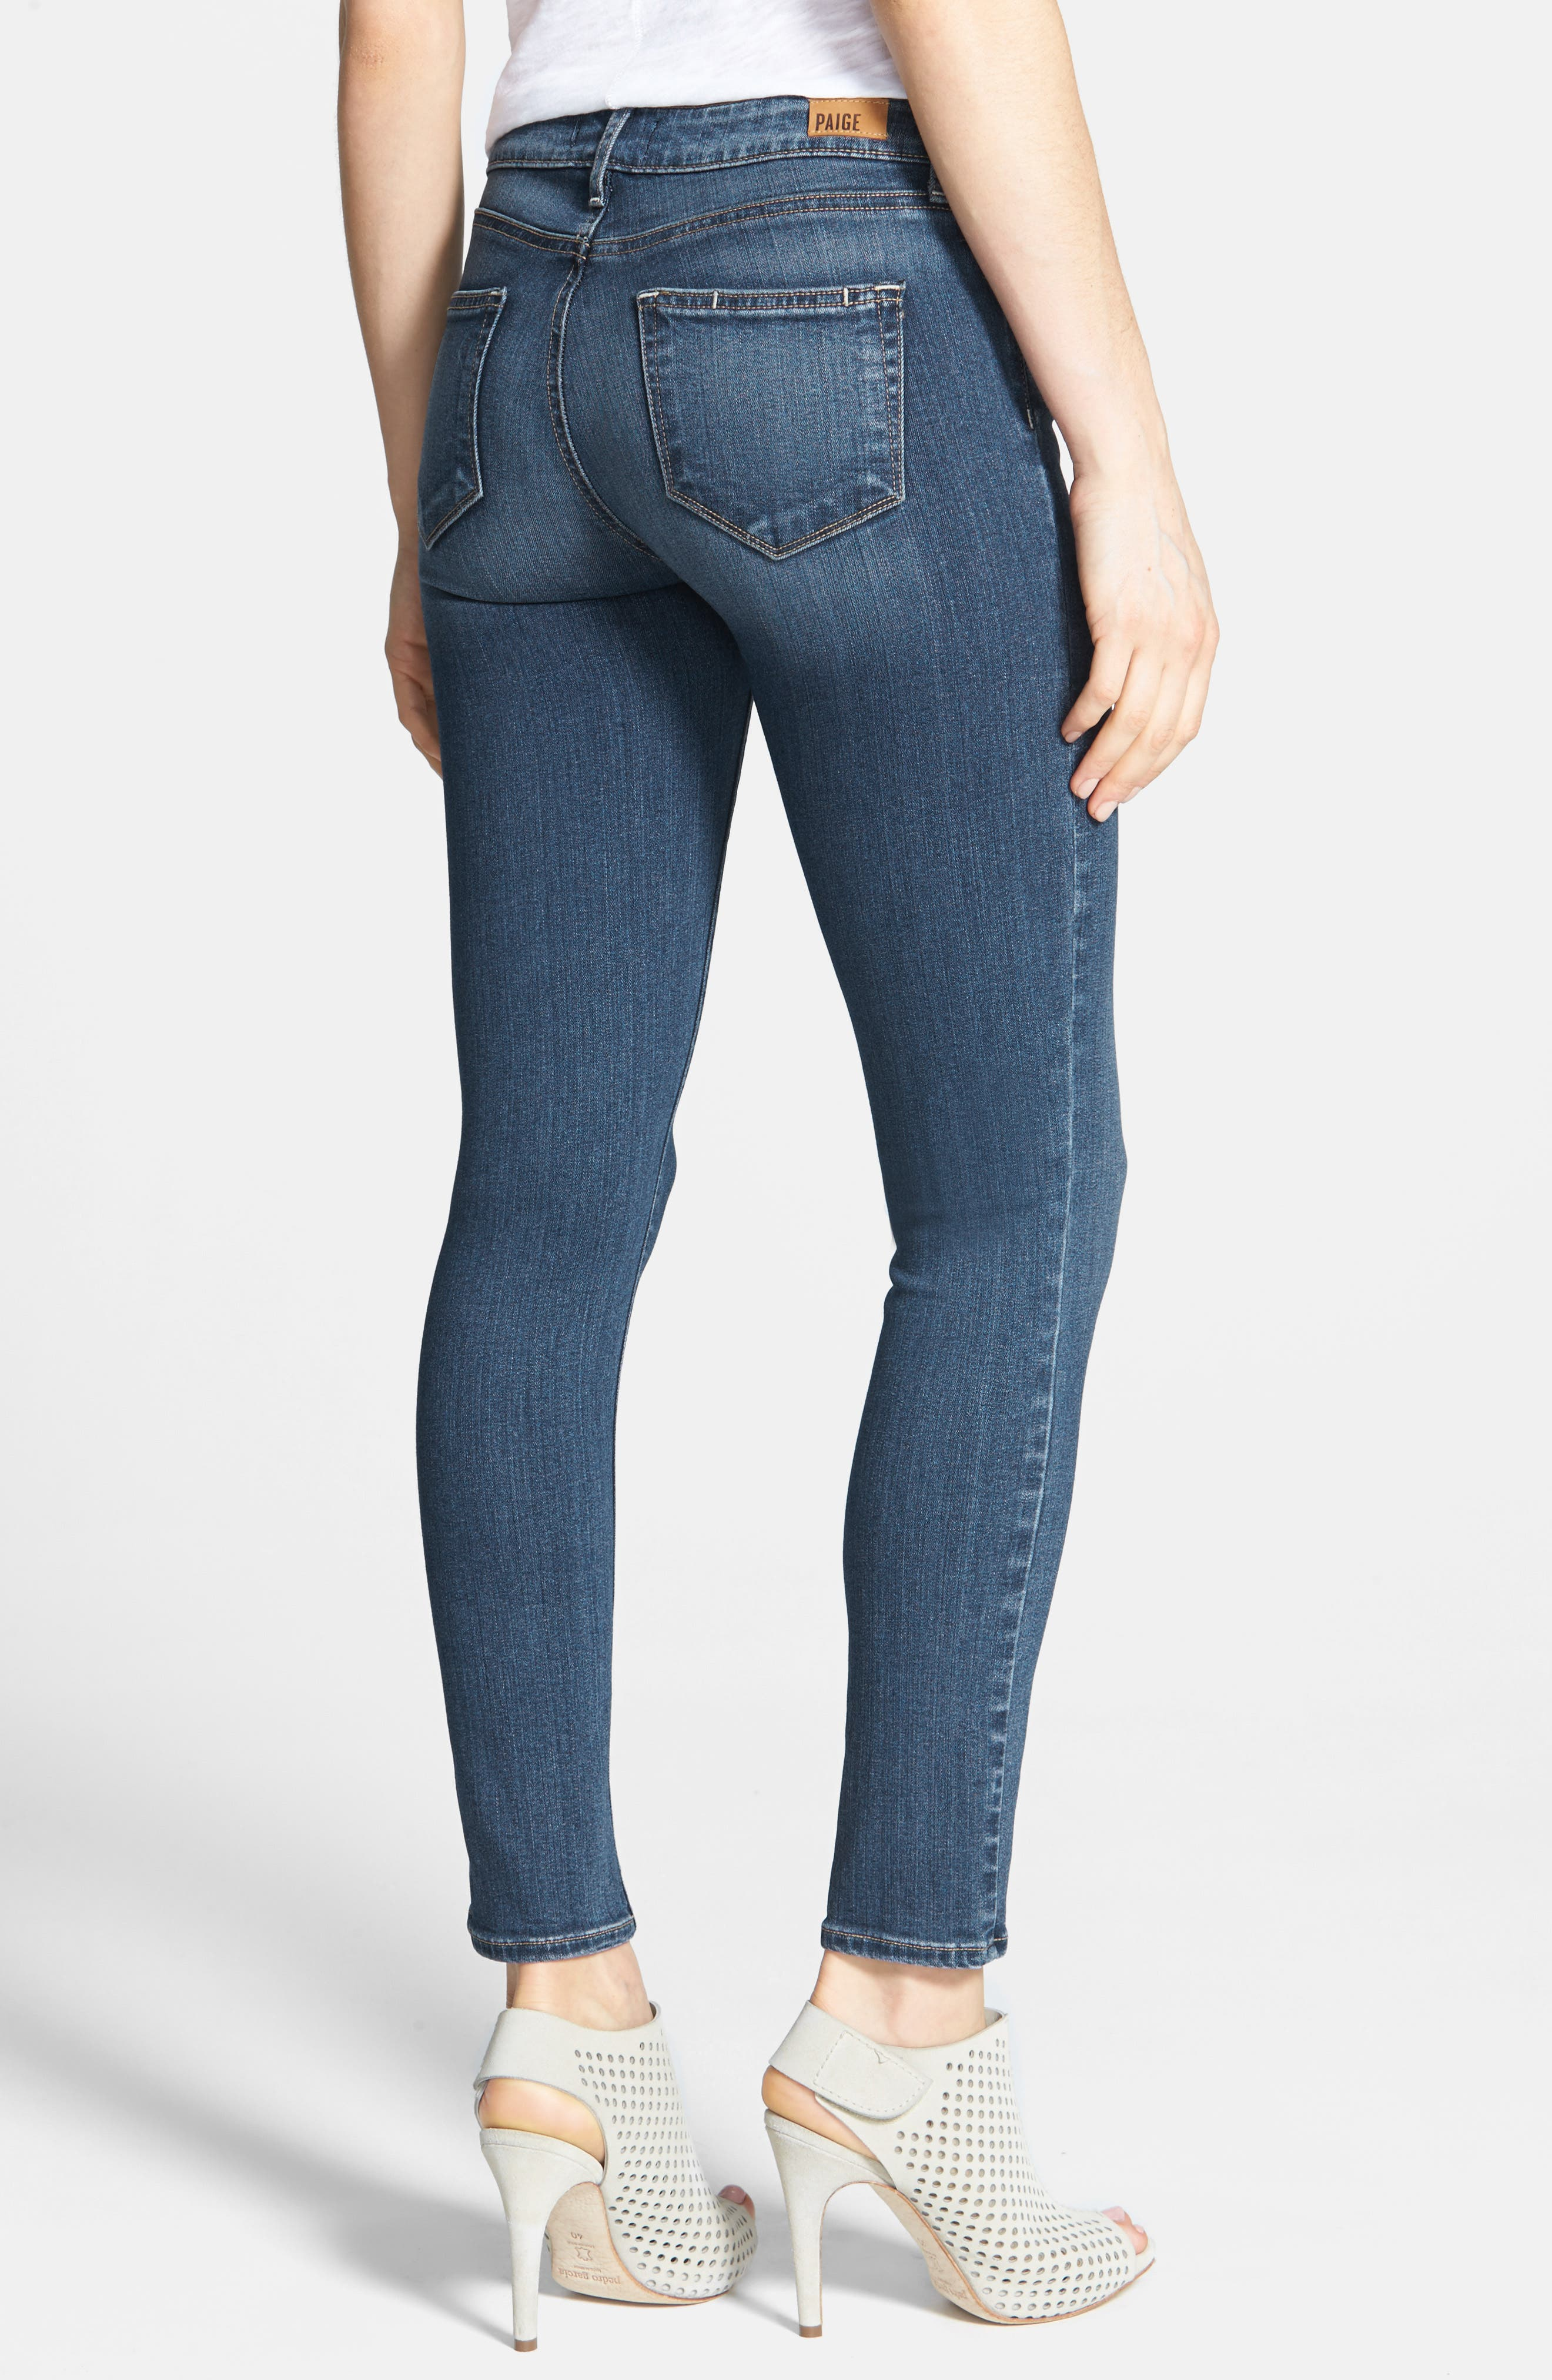 Transcend - Verdugo Ankle Skinny Jeans,                             Alternate thumbnail 3, color,                             TRISTAN